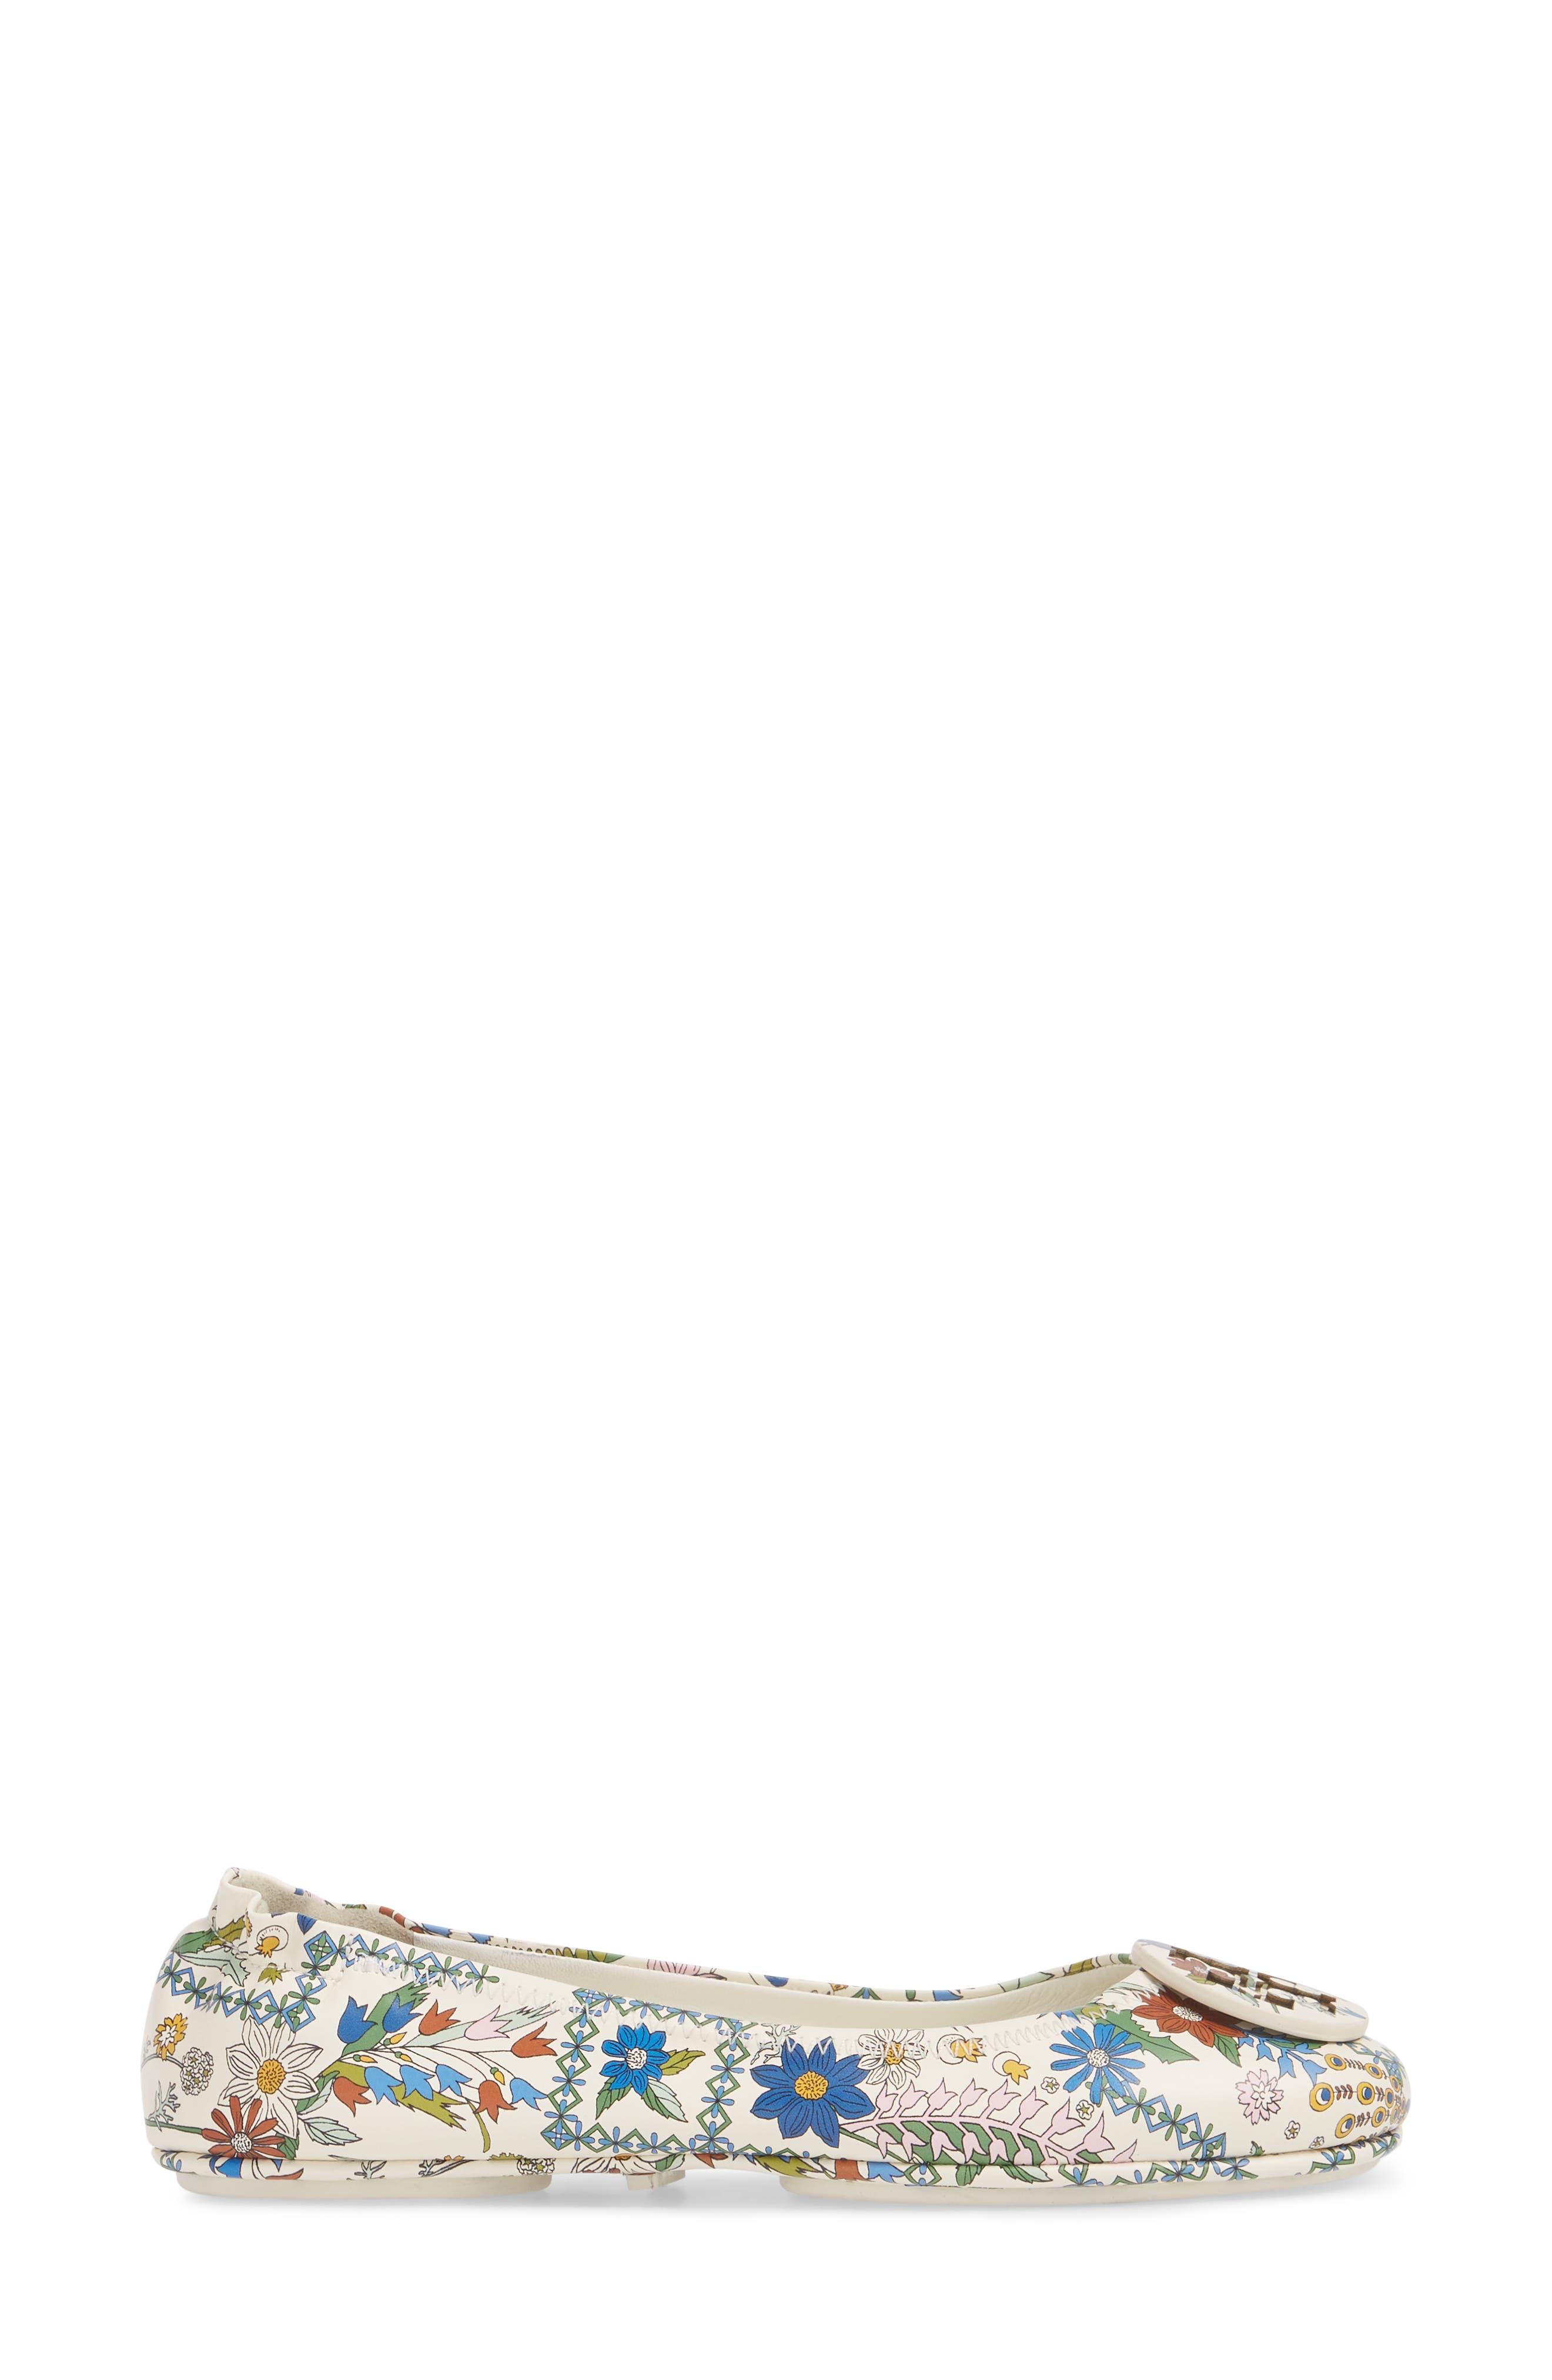 'Minnie' Travel Ballet Flat,                             Alternate thumbnail 153, color,